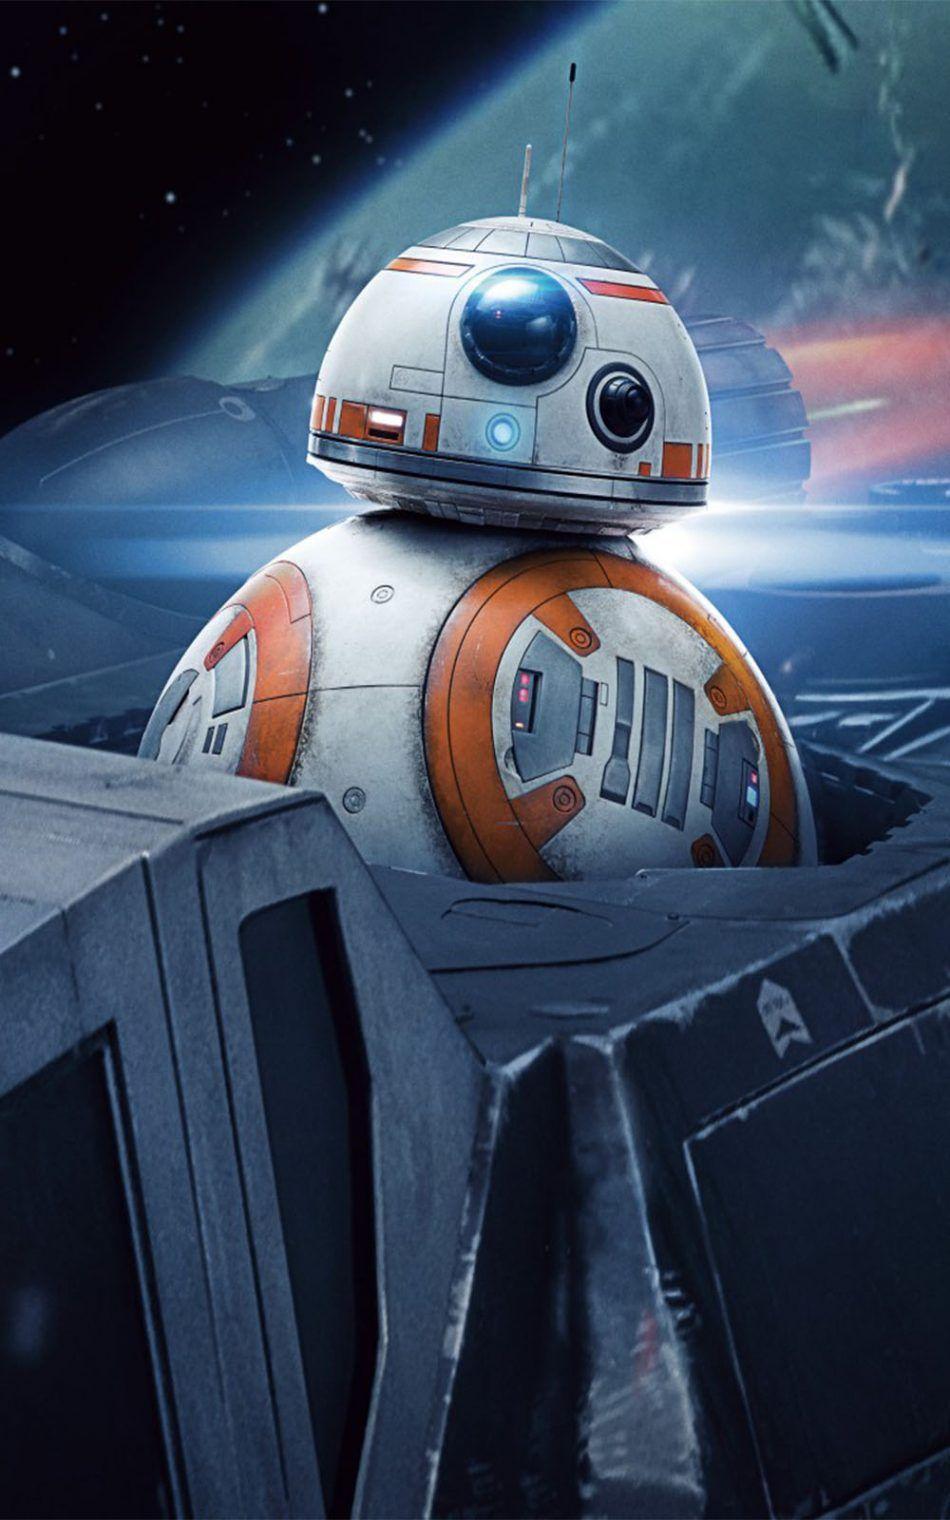 Star Wars Phone Wallpapers - Top Free Star Wars Phone ...